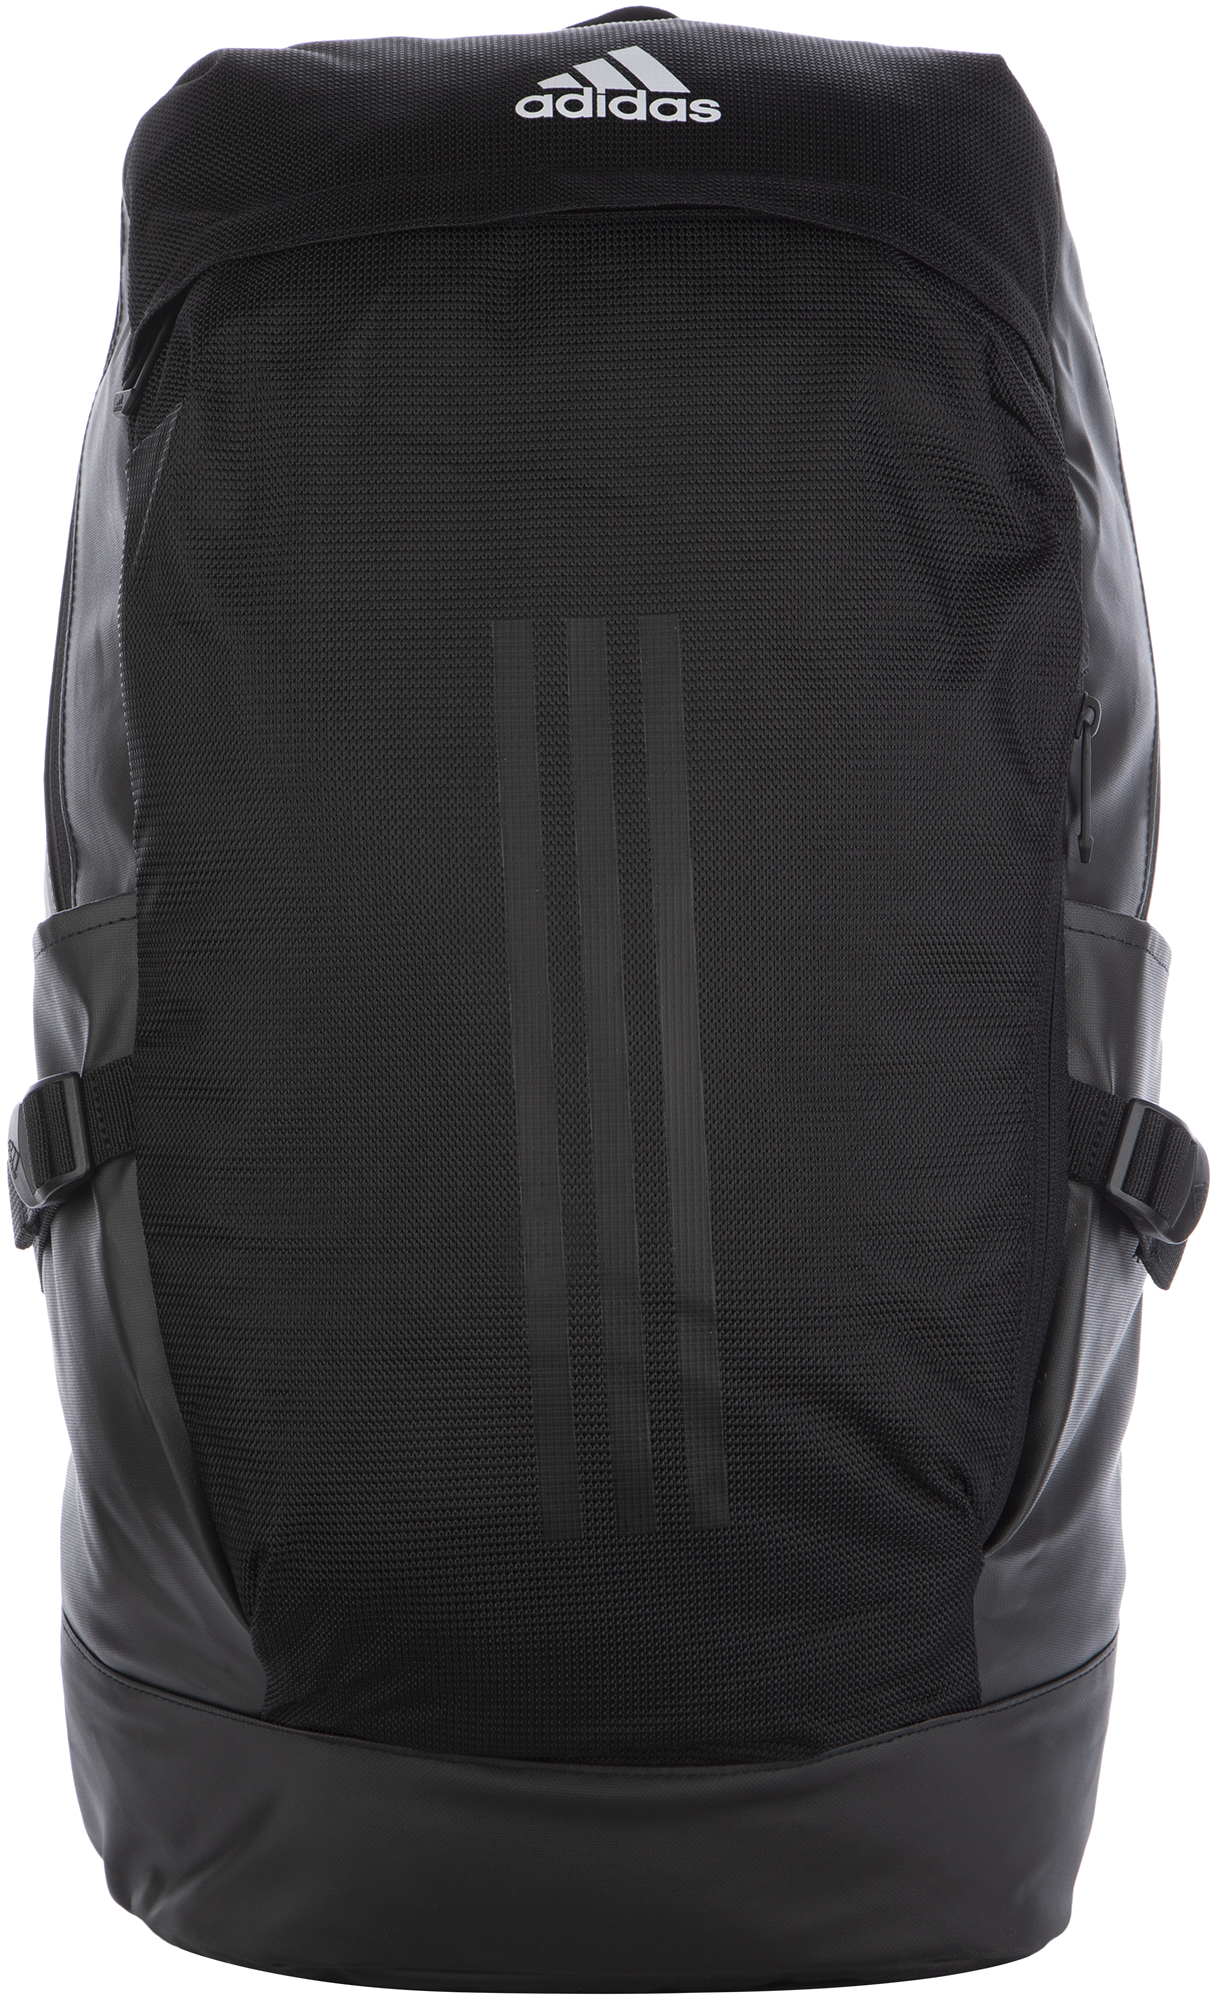 Adidas Рюкзак Endurance Packing System